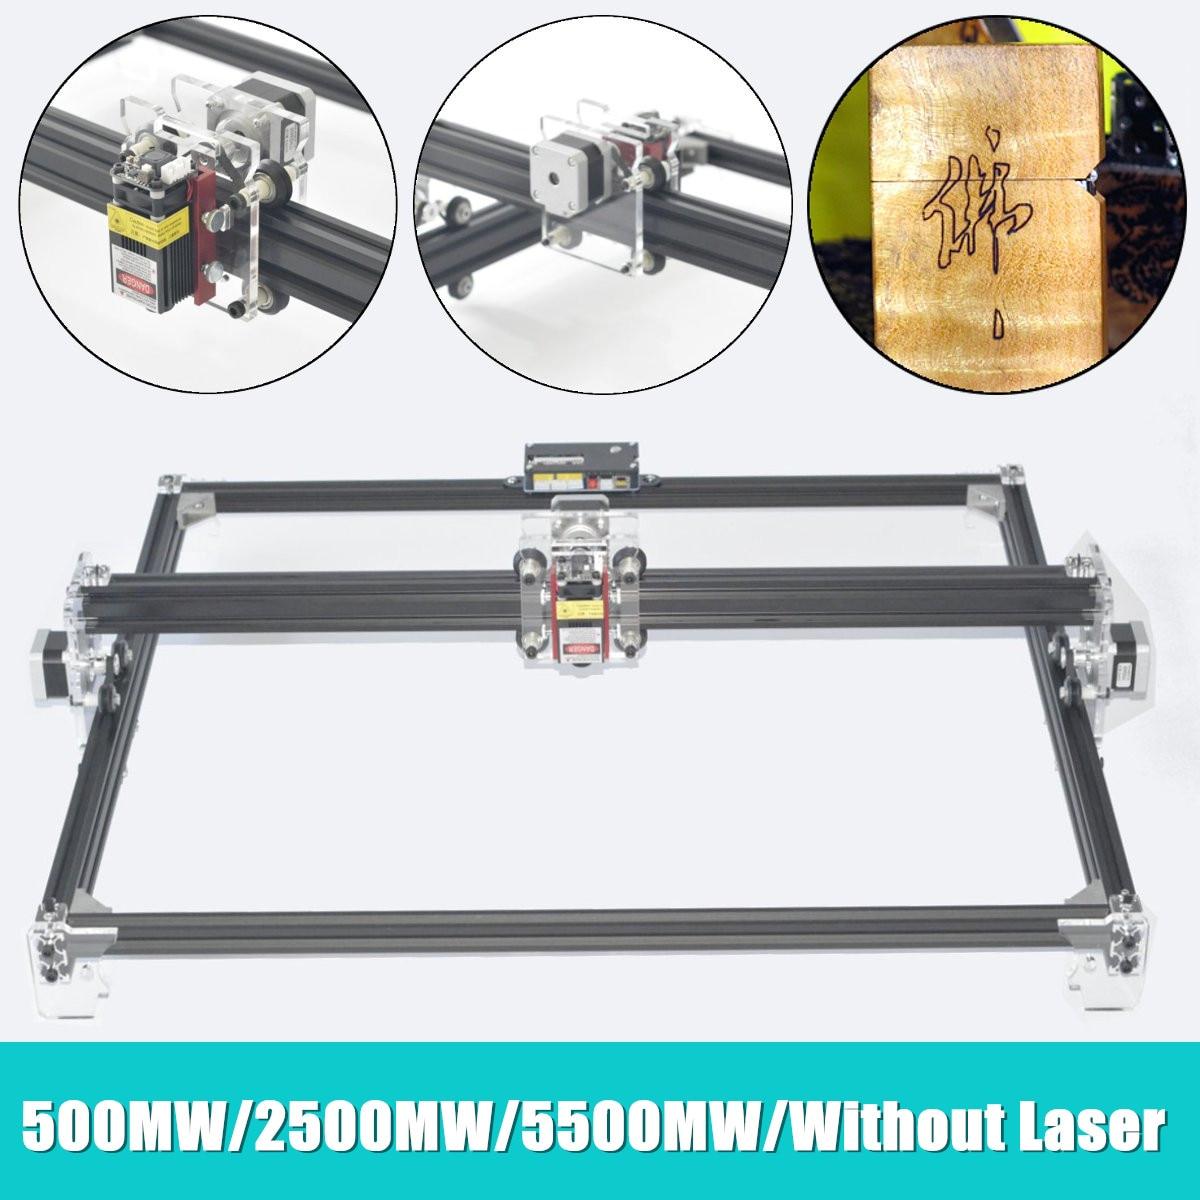 500MW/2500MW/5500MW DIY Laser Engraver Machine DVP6550 Wood Router CNC MiniUSB DIY Engraver Desktop Wood Router/Cutter/Printer